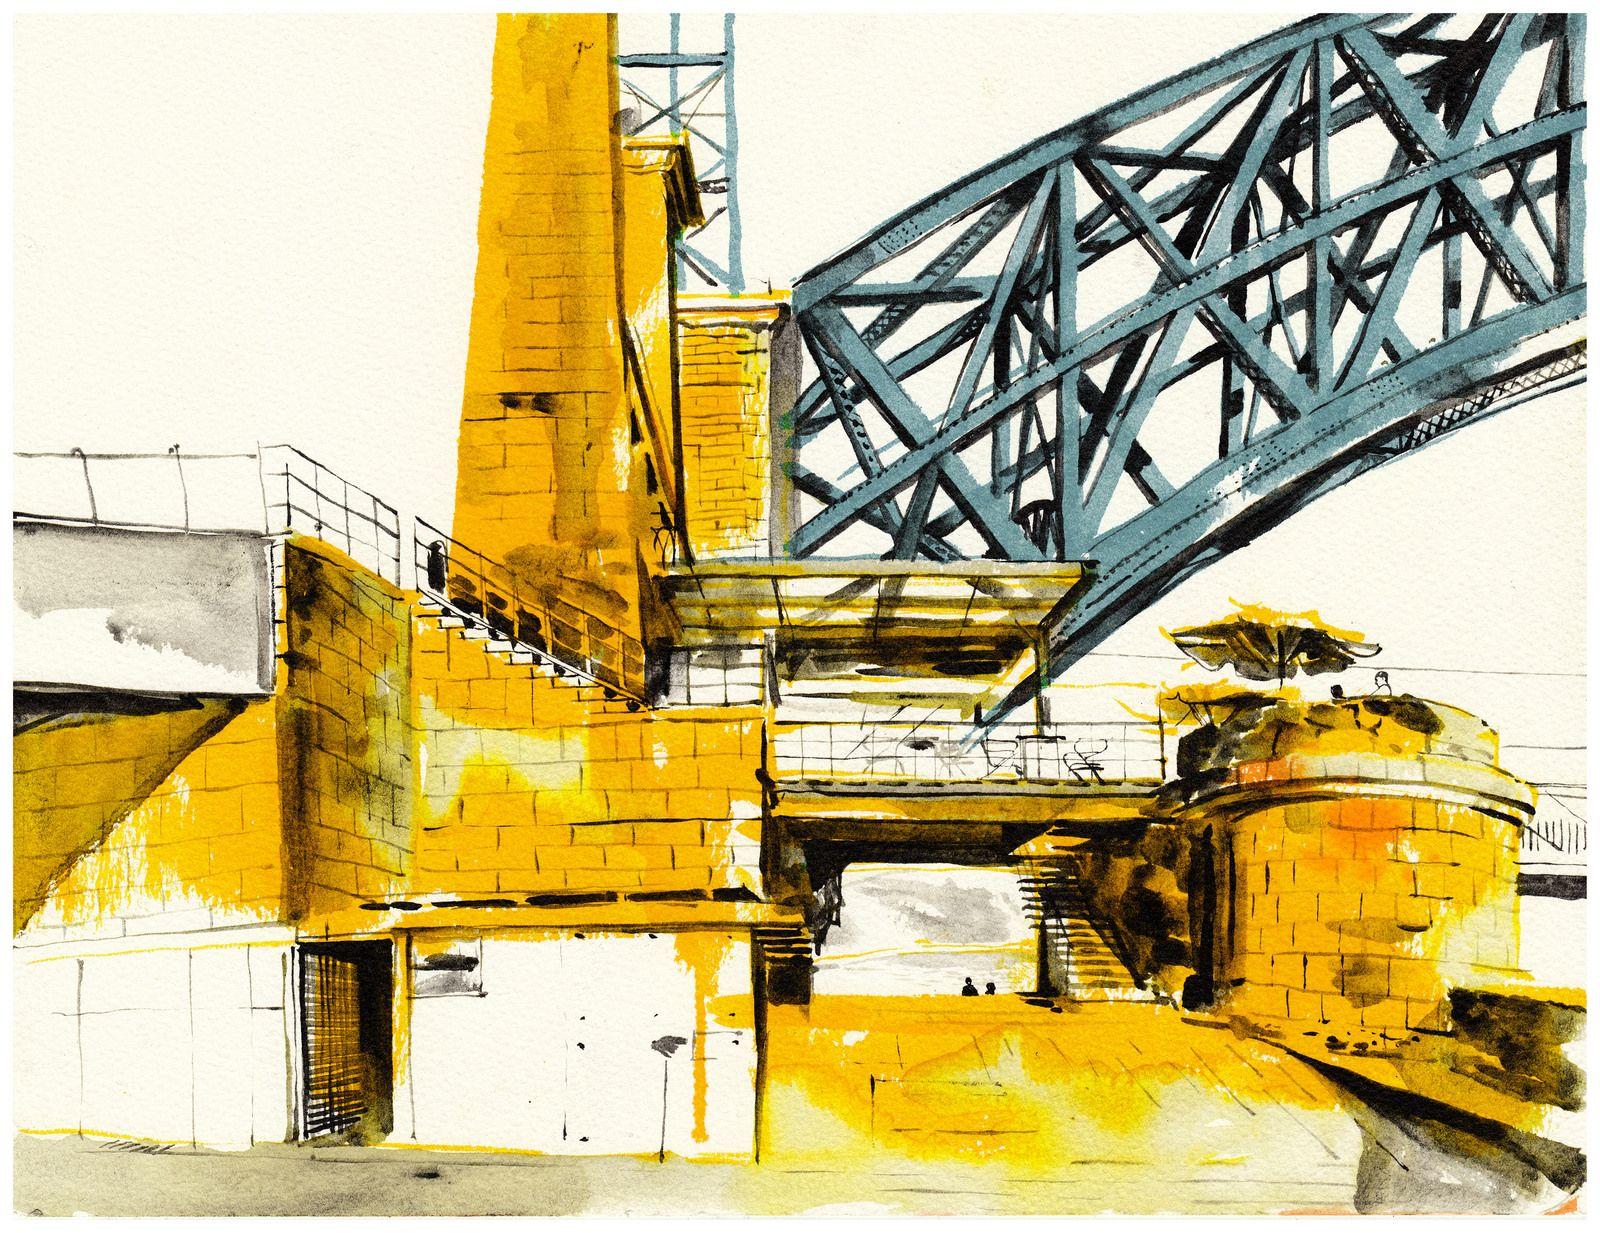 Luís I Bridge | by André Carrilho's Sketch Blog